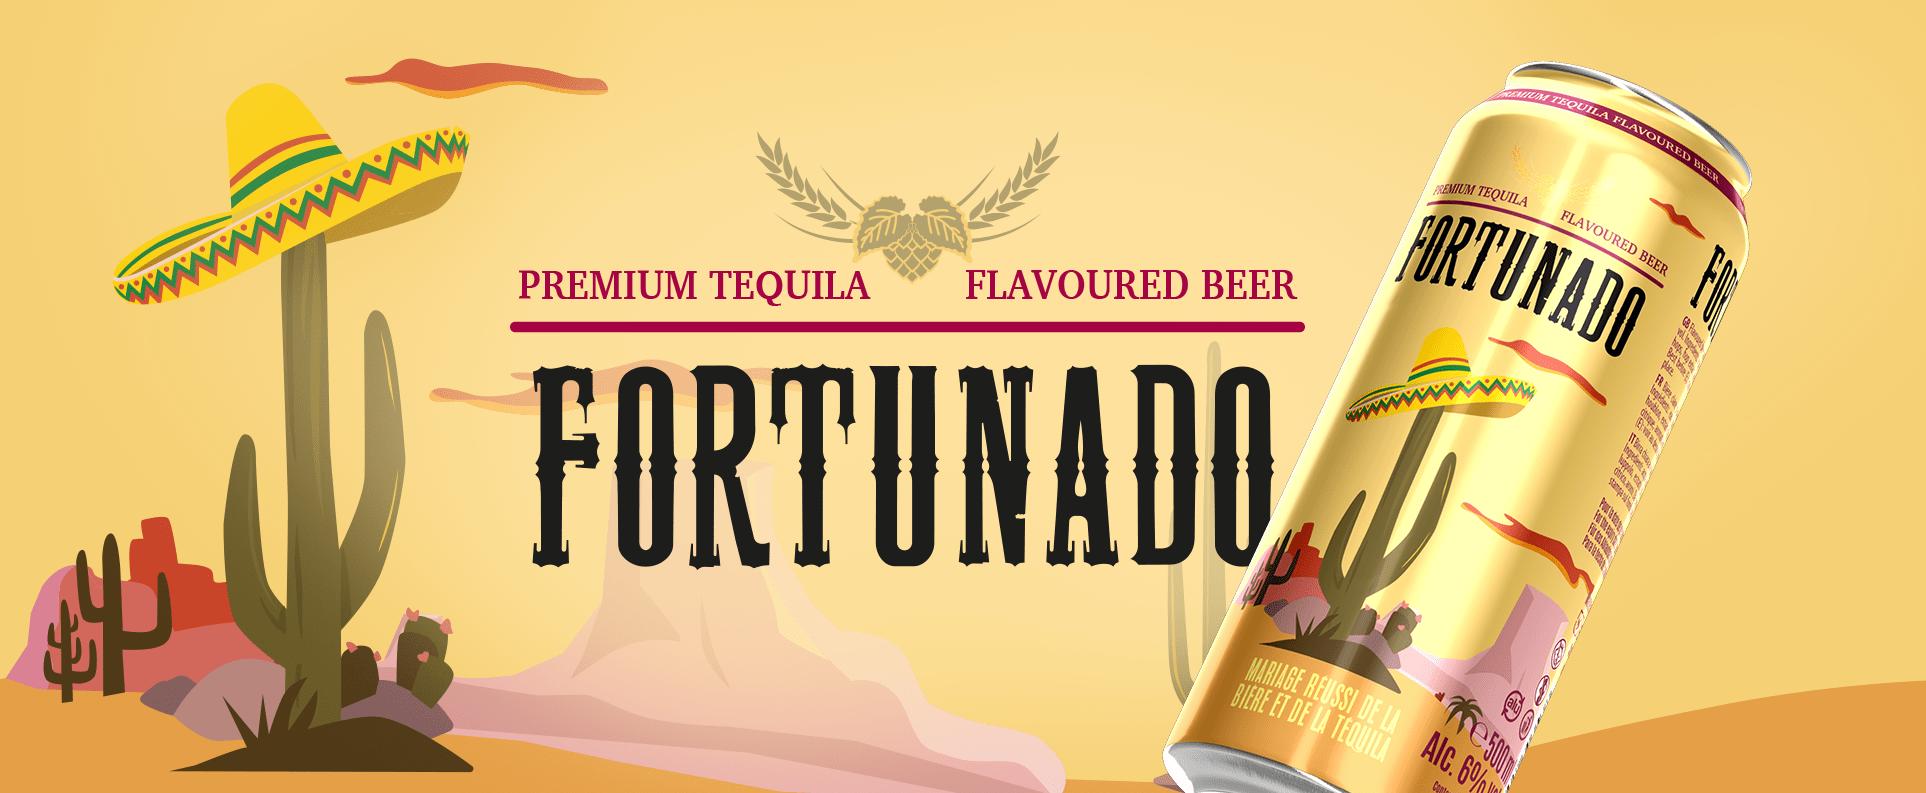 Bières Fortunado